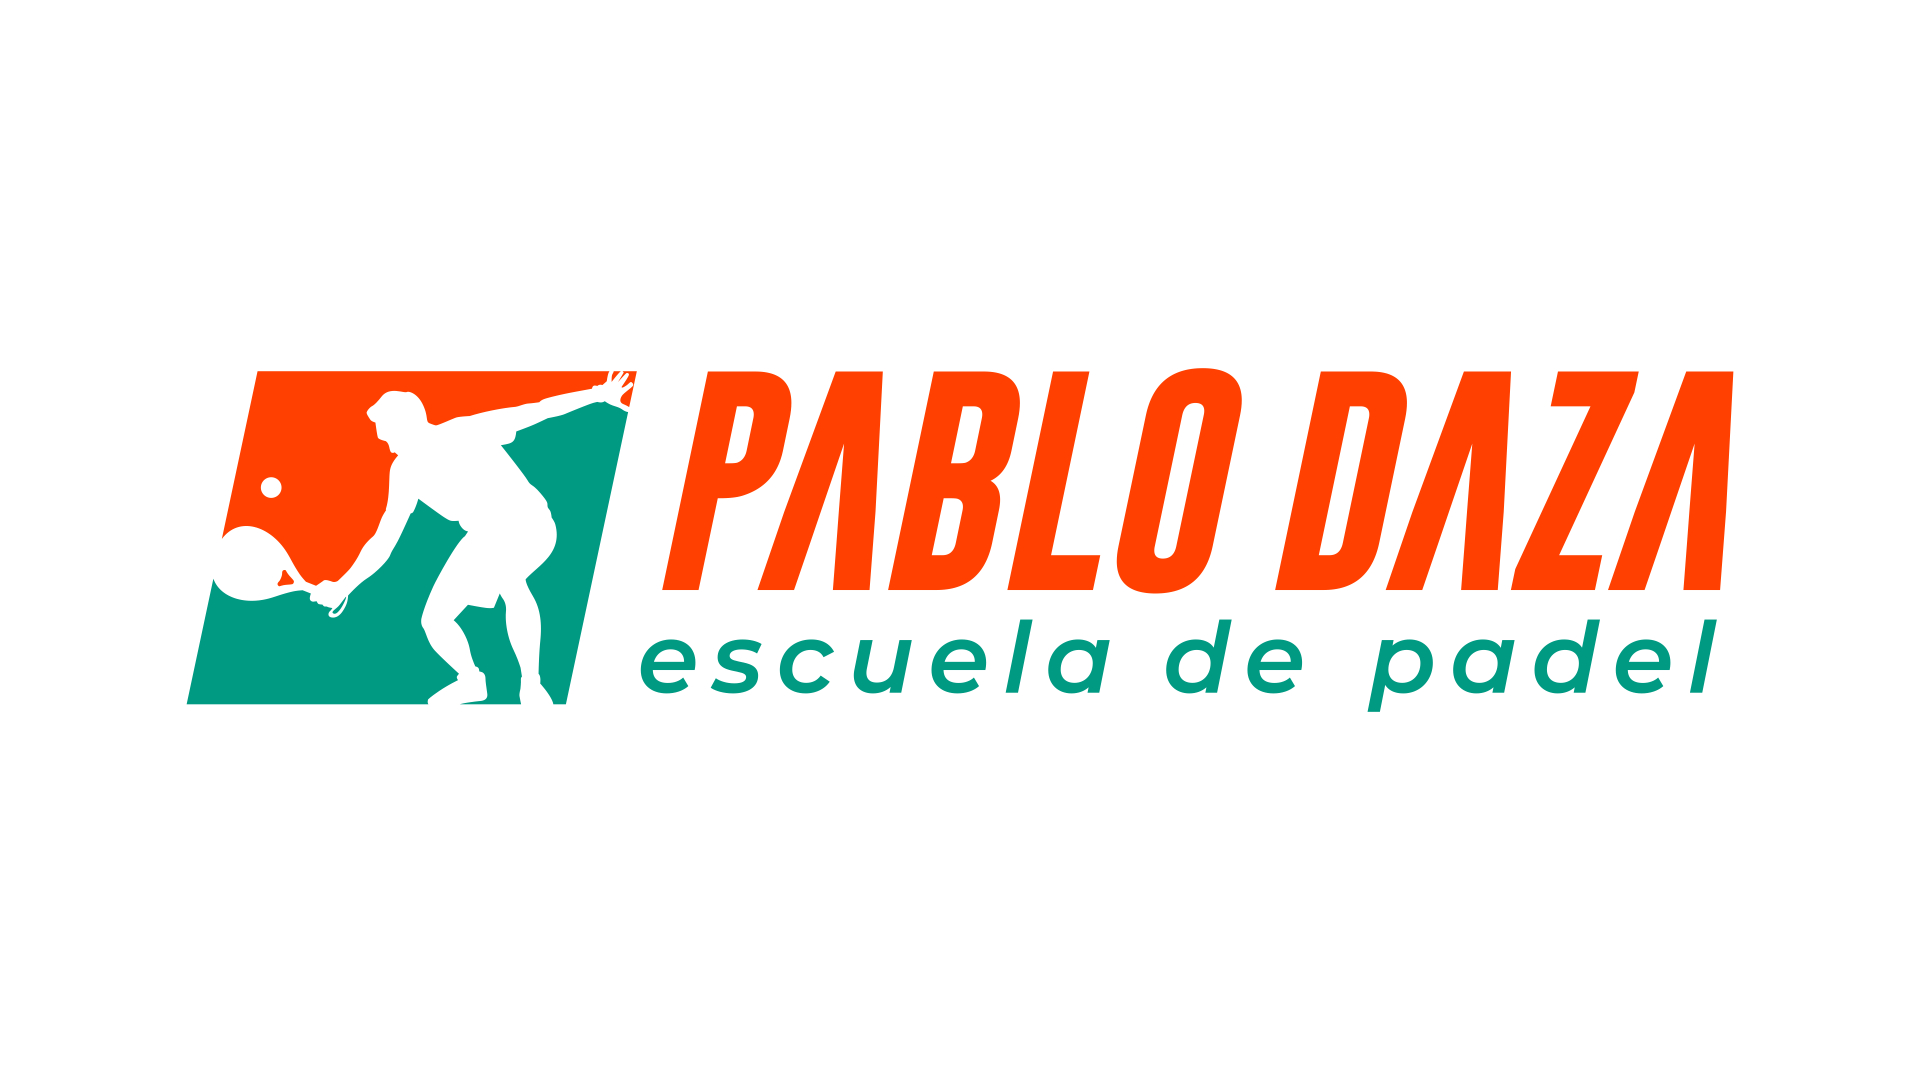 Pablo Daza